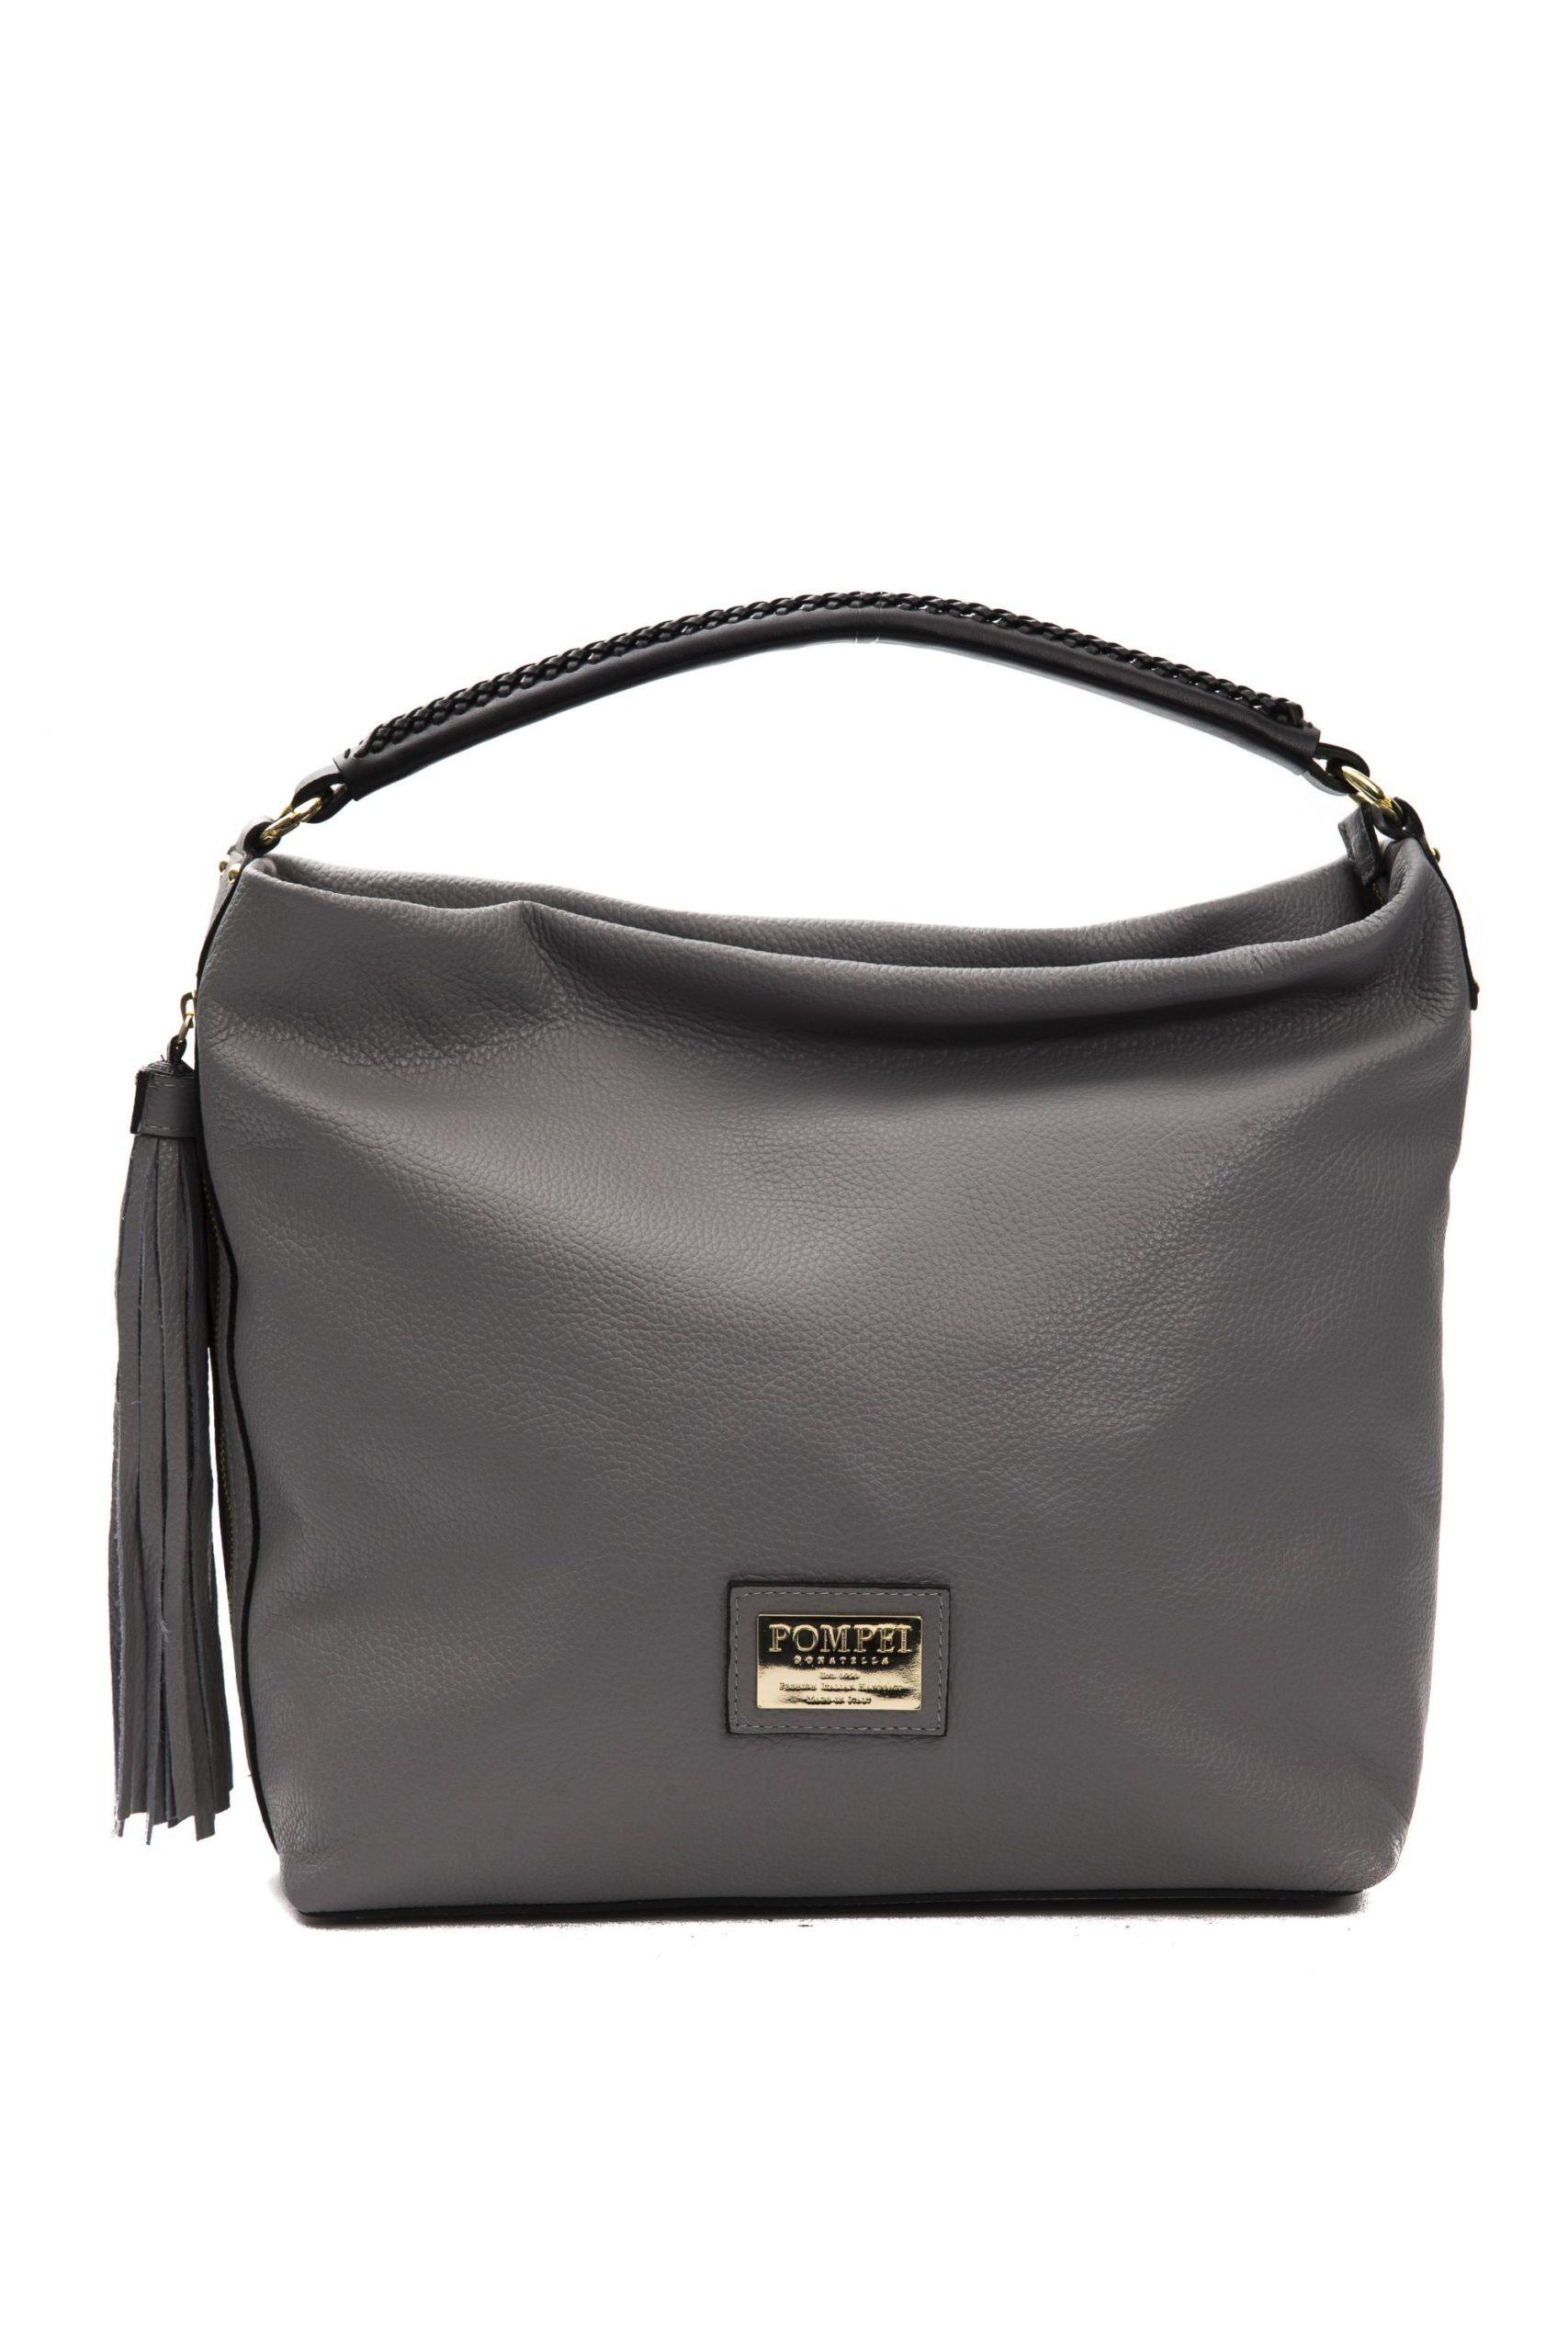 Pompei Donatella Women's Fog Shoulder Bag Grey PO1005083